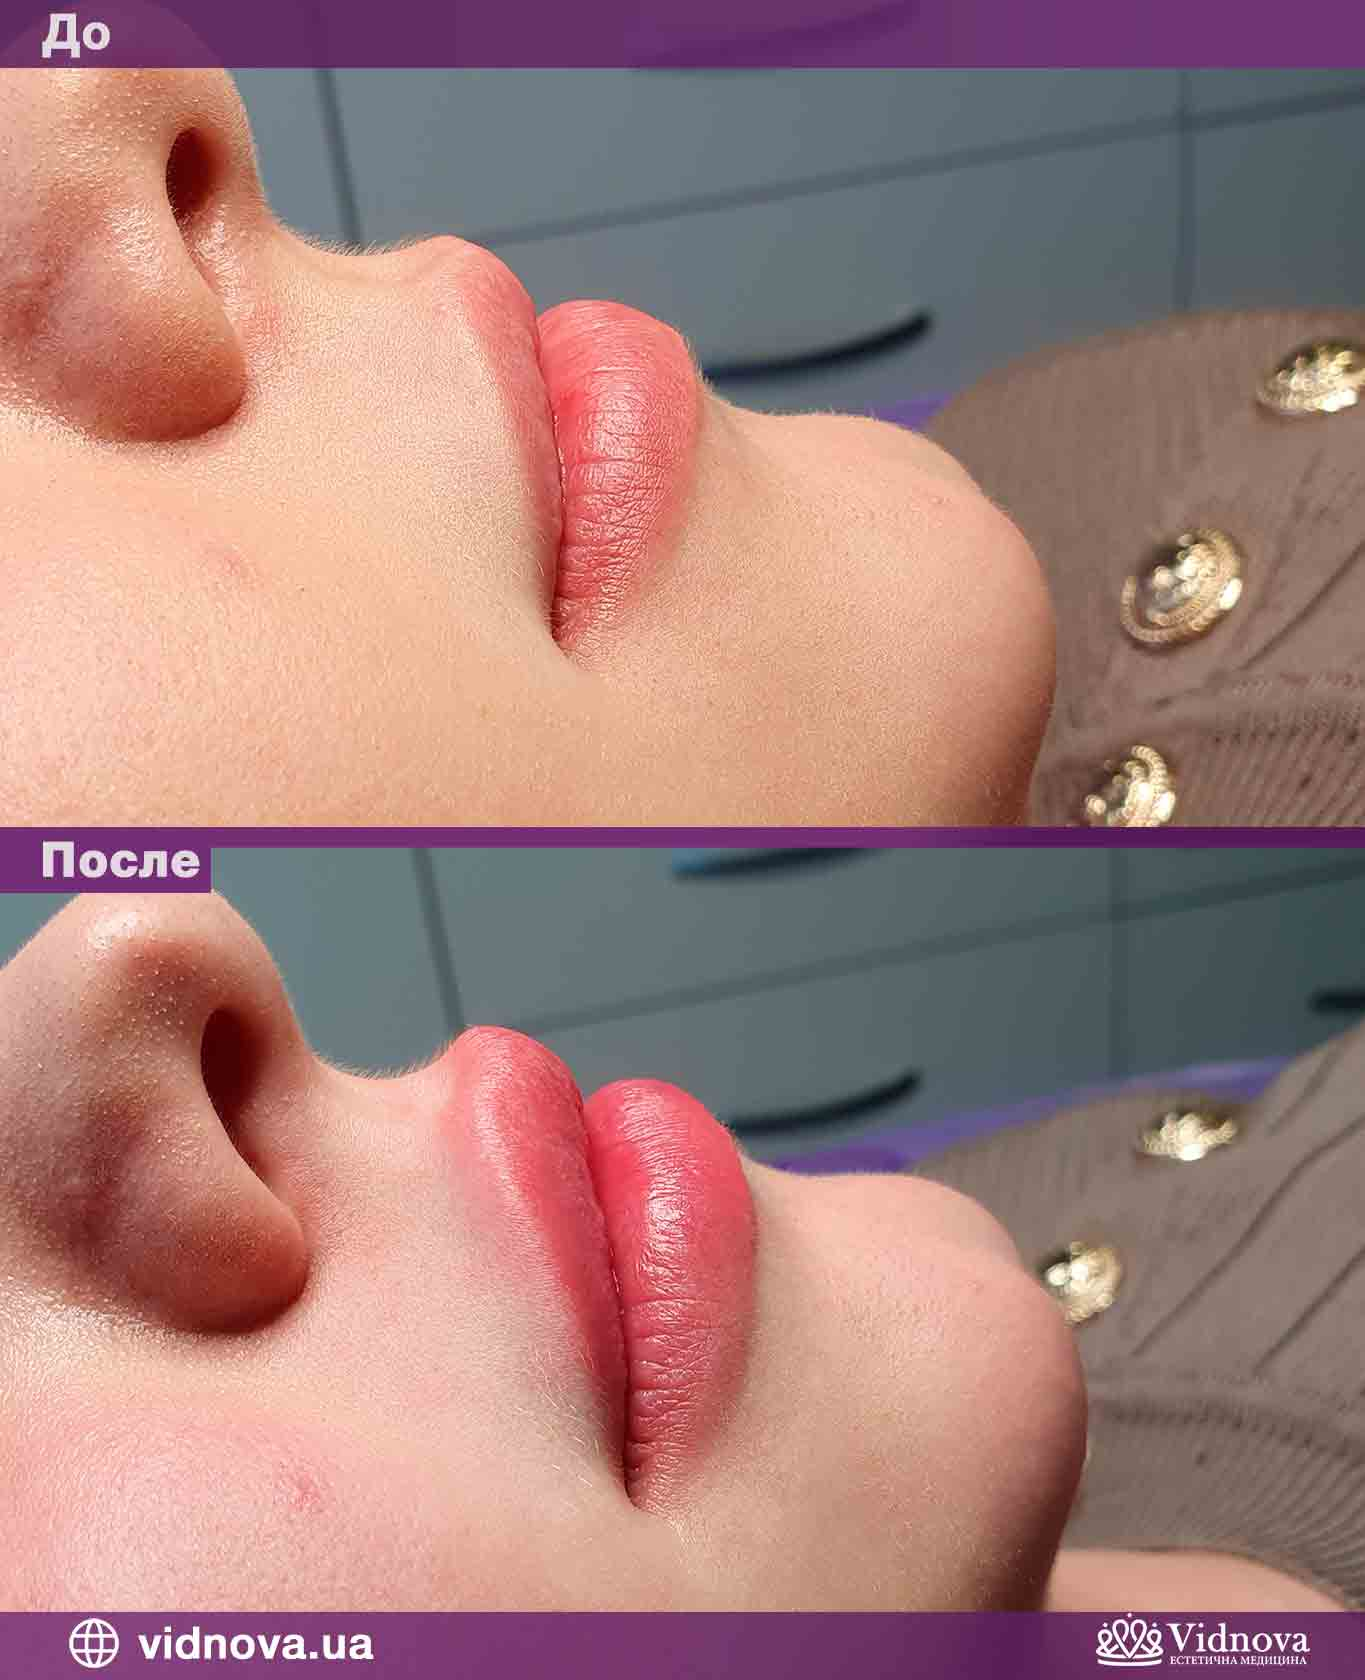 Увеличение губ: Фото До и После - Пример №5-2 - Клиника Vidnova